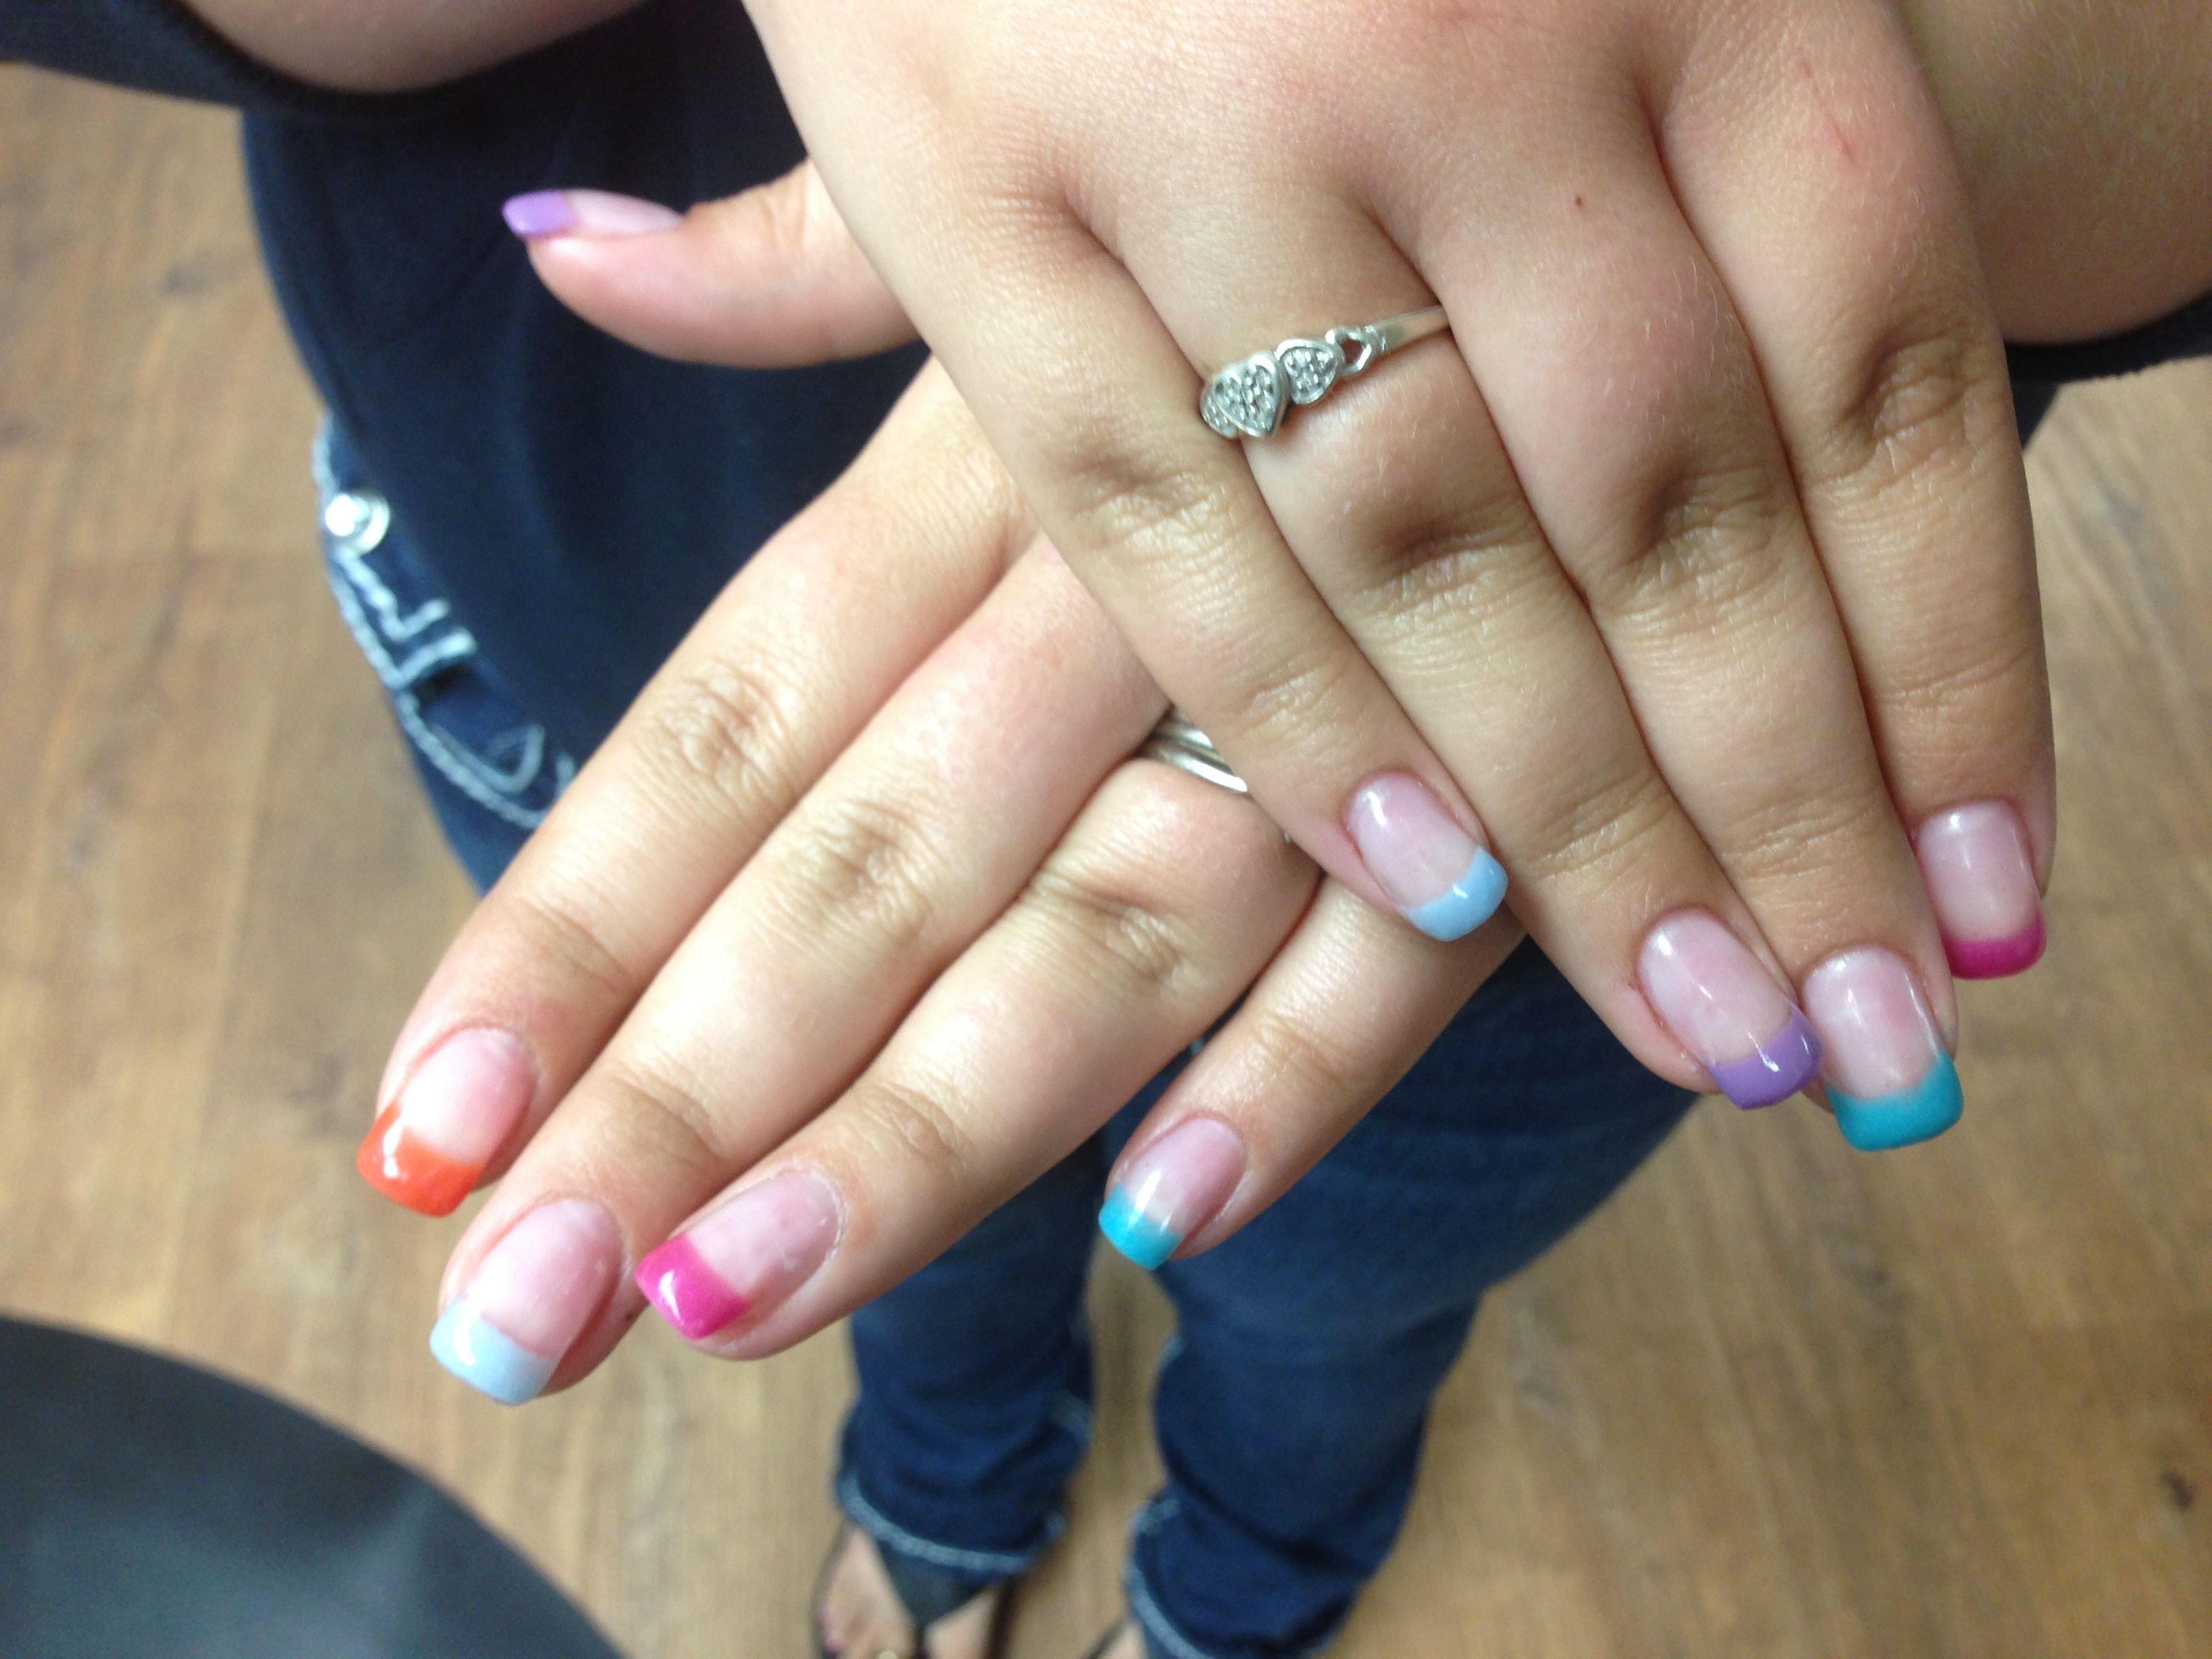 Sams Multi Coloured Tips Gel Nail Art Nails Ive Done